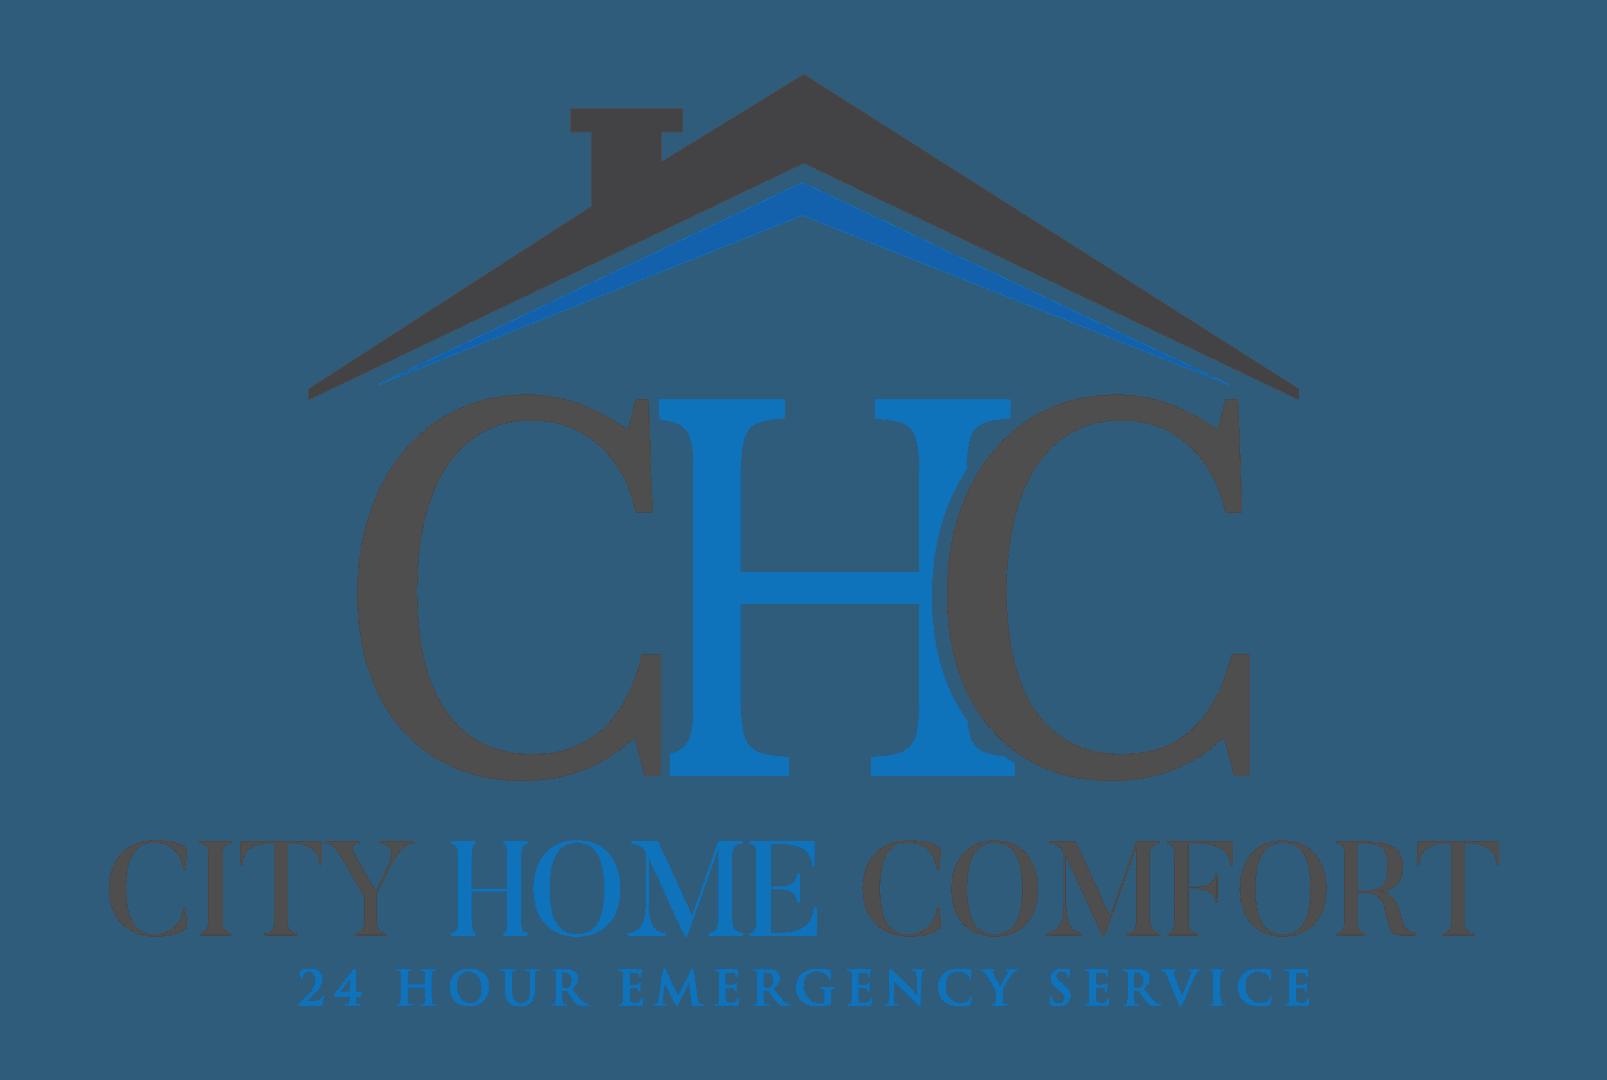 City Home Comfort LOGO